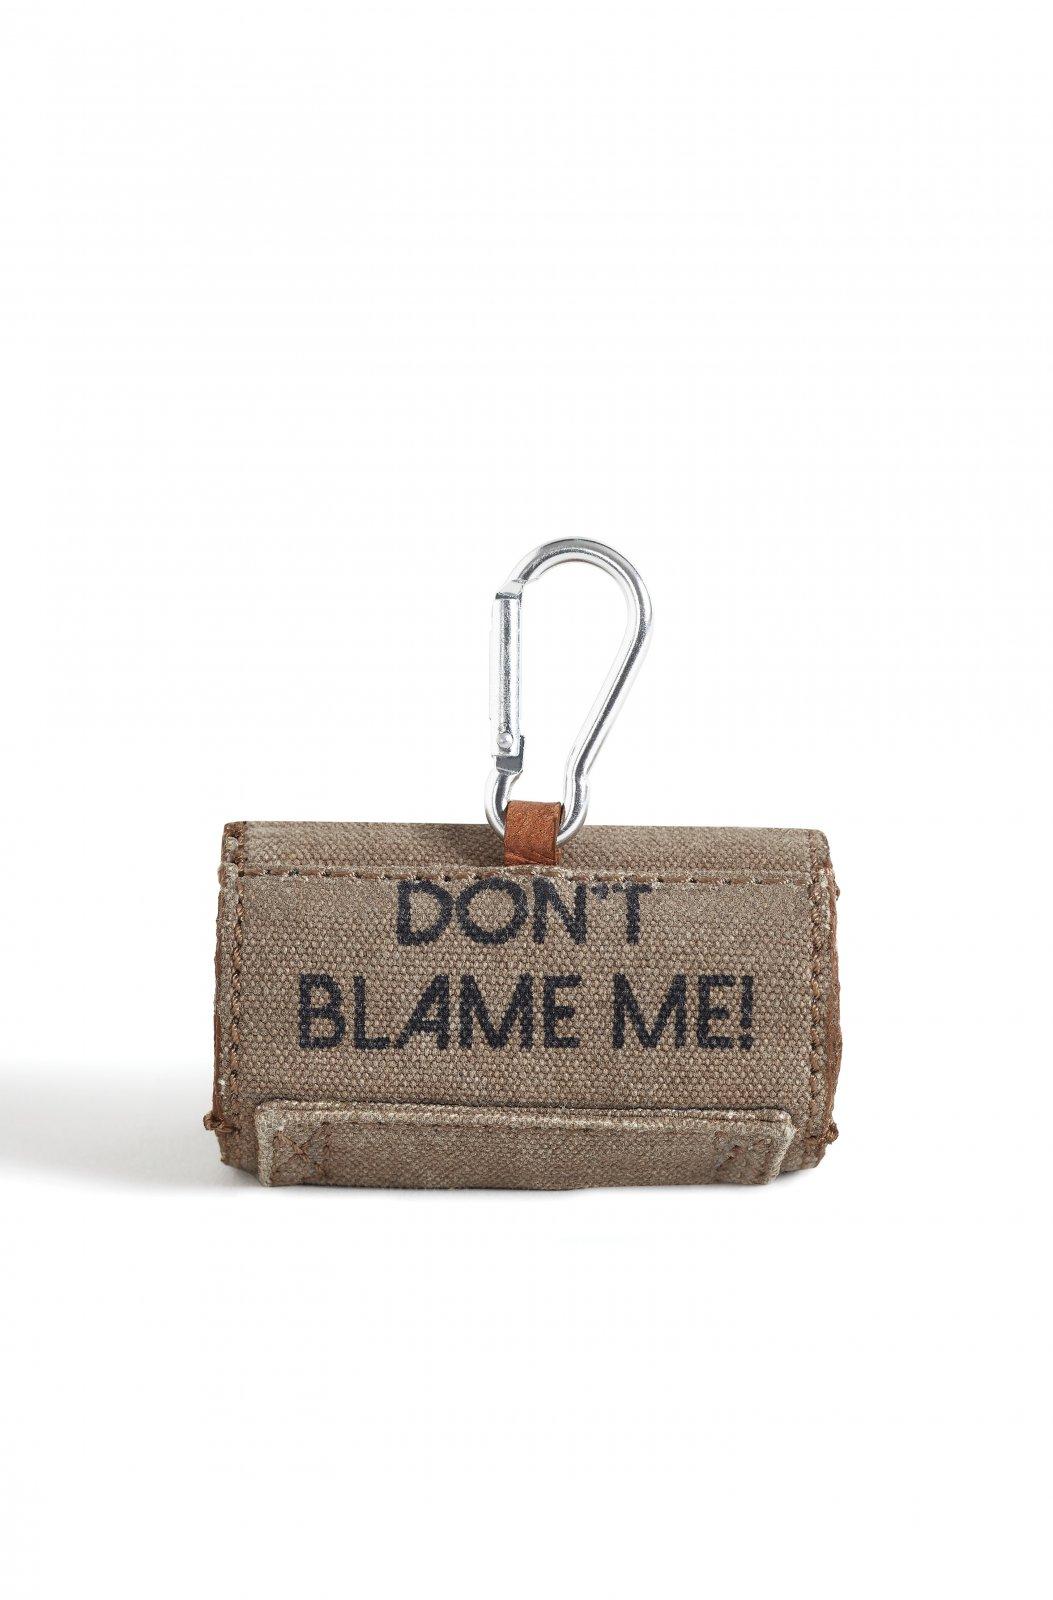 DON'T BLAME ME BAG DISPENSER